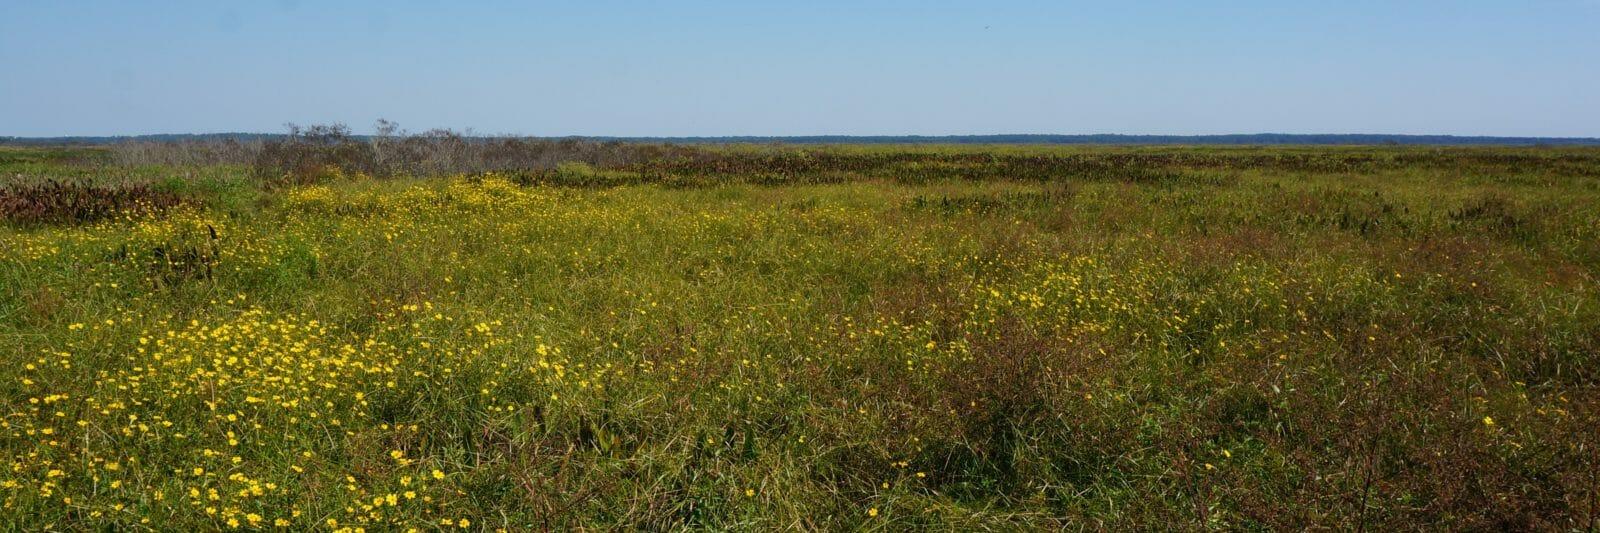 Paynes Prairie sunflowers